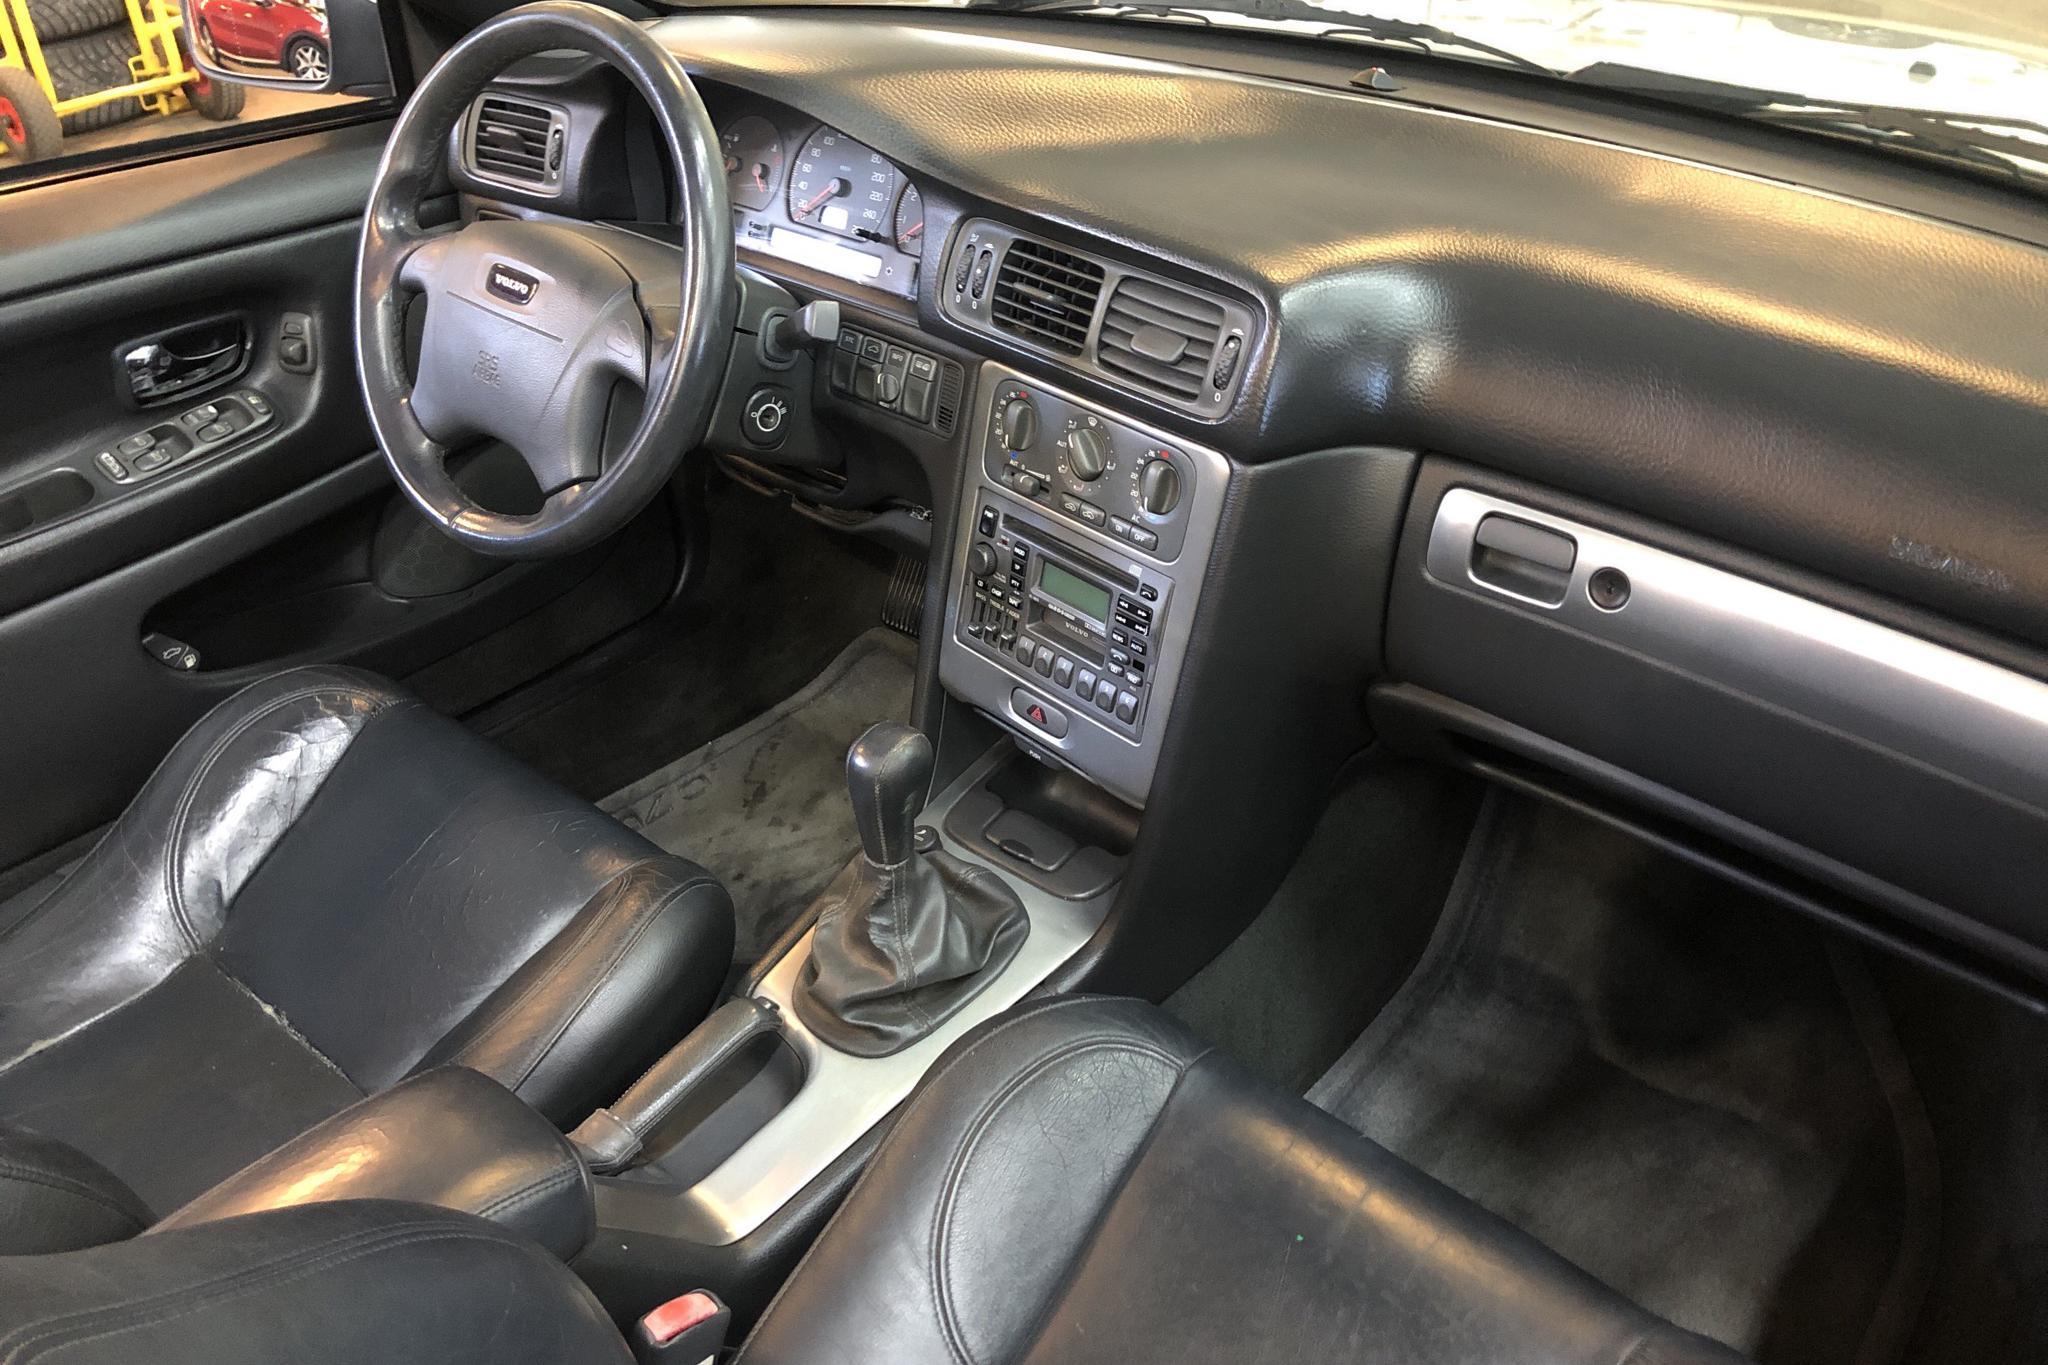 Volvo C70 2.4T Cabriolet (193hk) - 15 751 mil - Manuell - silver - 2002